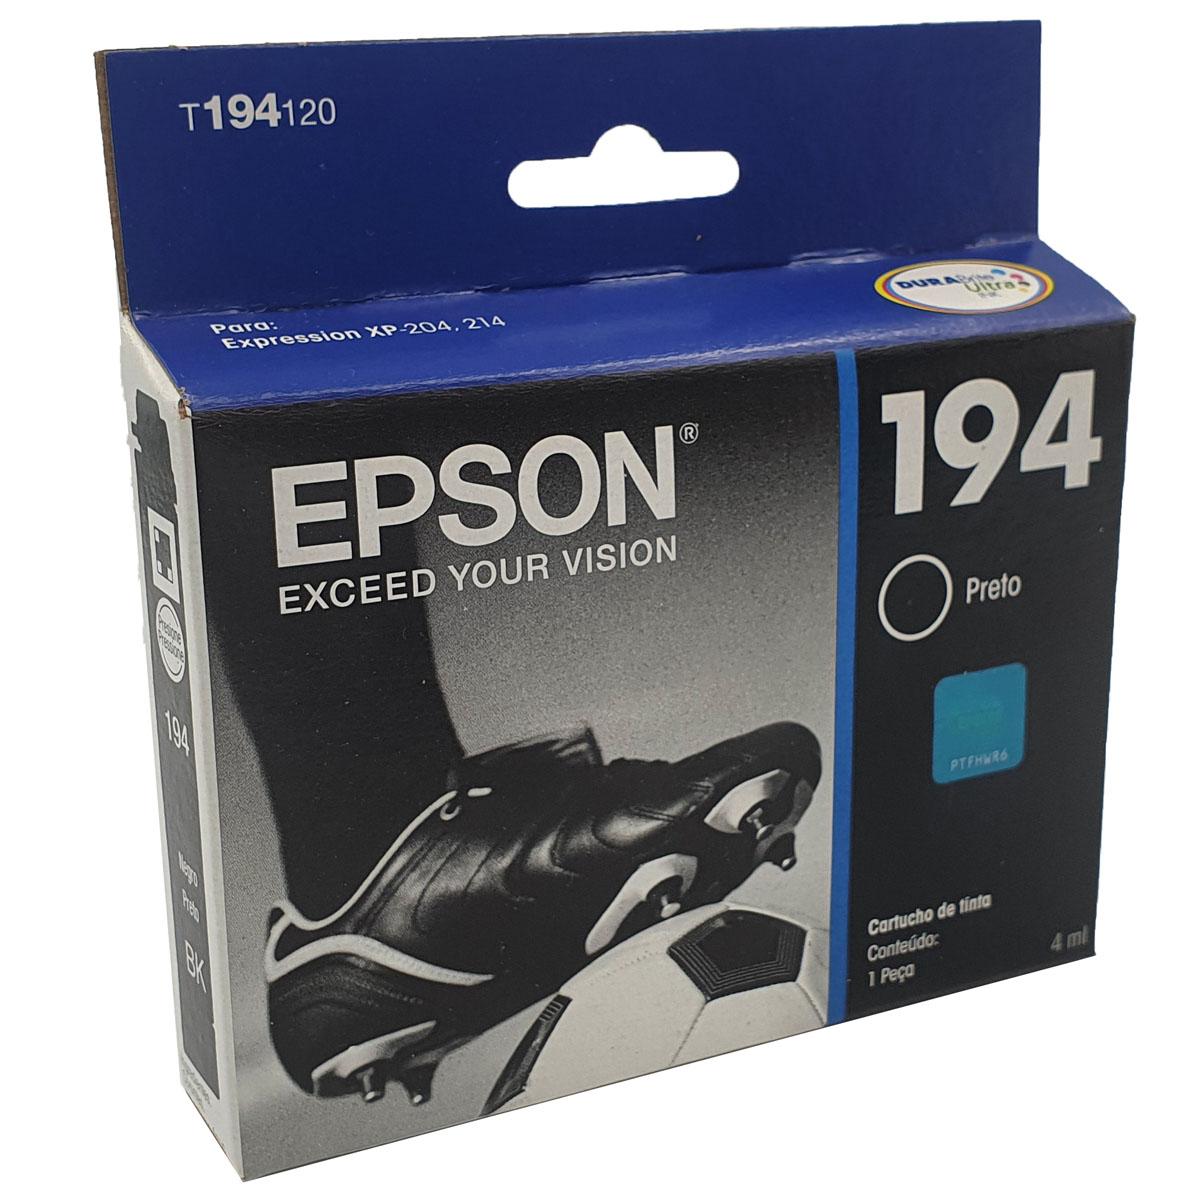 Cartucho EPSON T194120 T194 194 Preto para XP-104 XP204